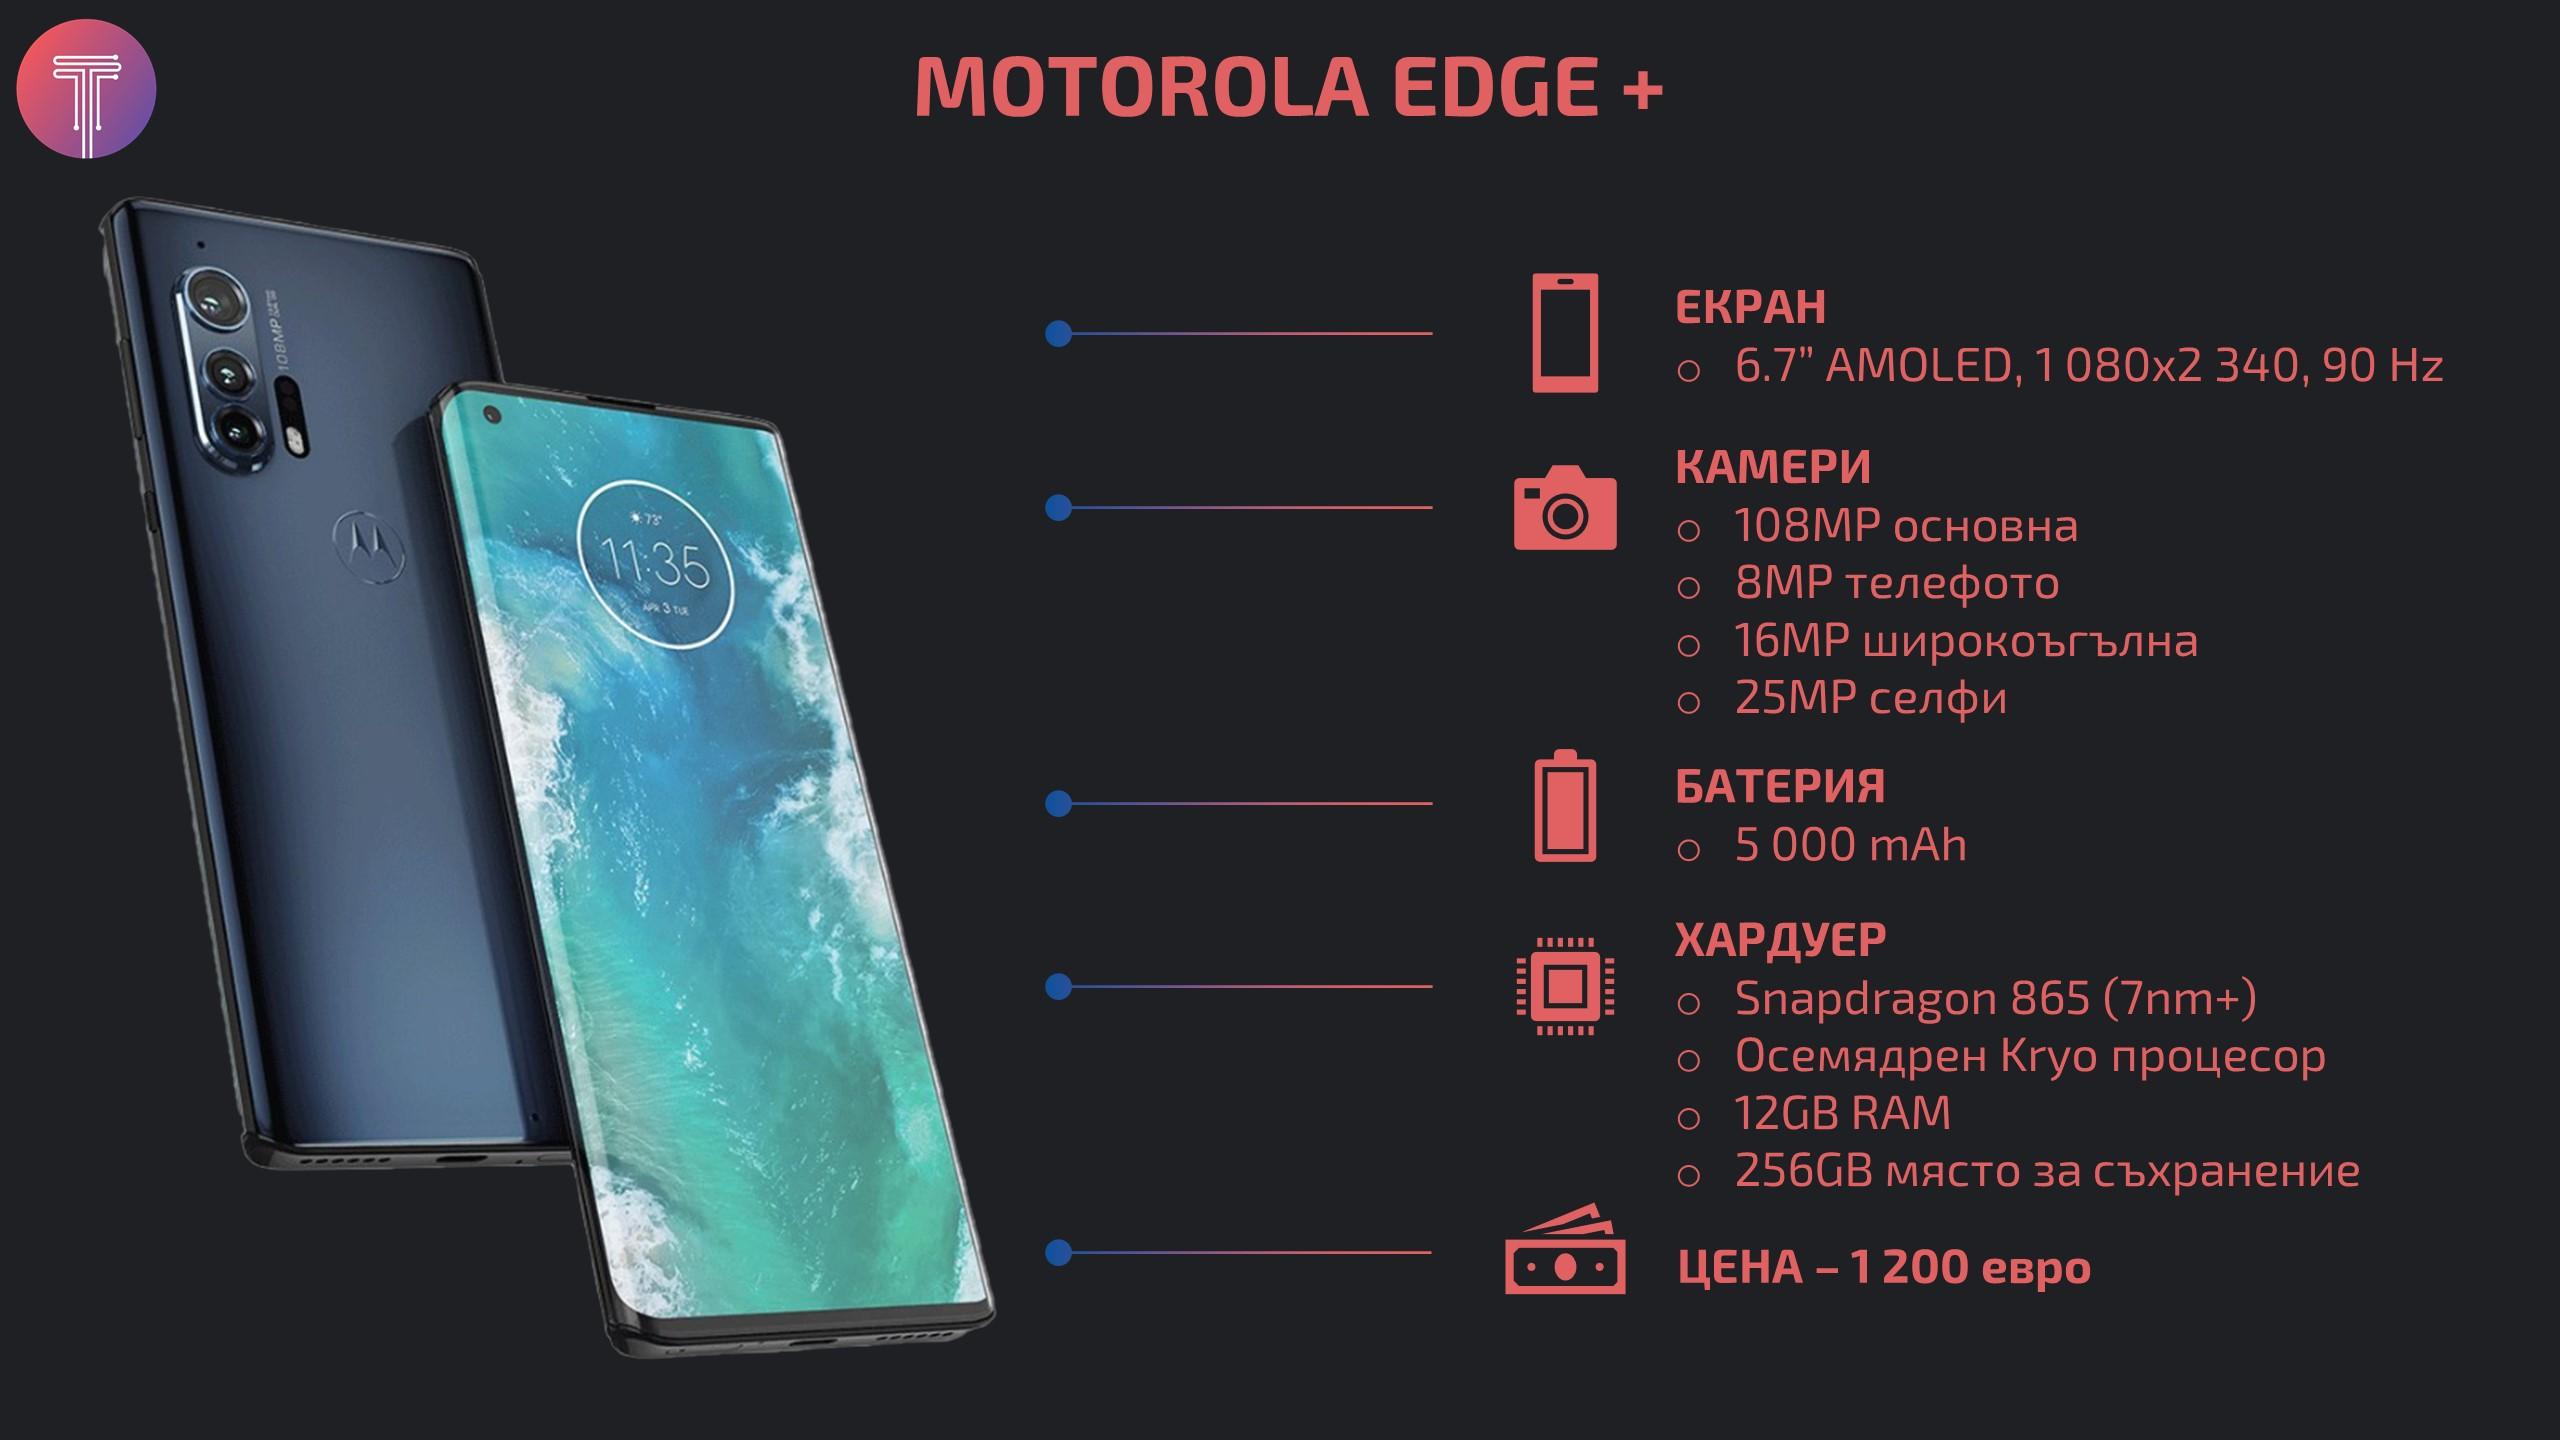 Motorola Edge Plus Infographic